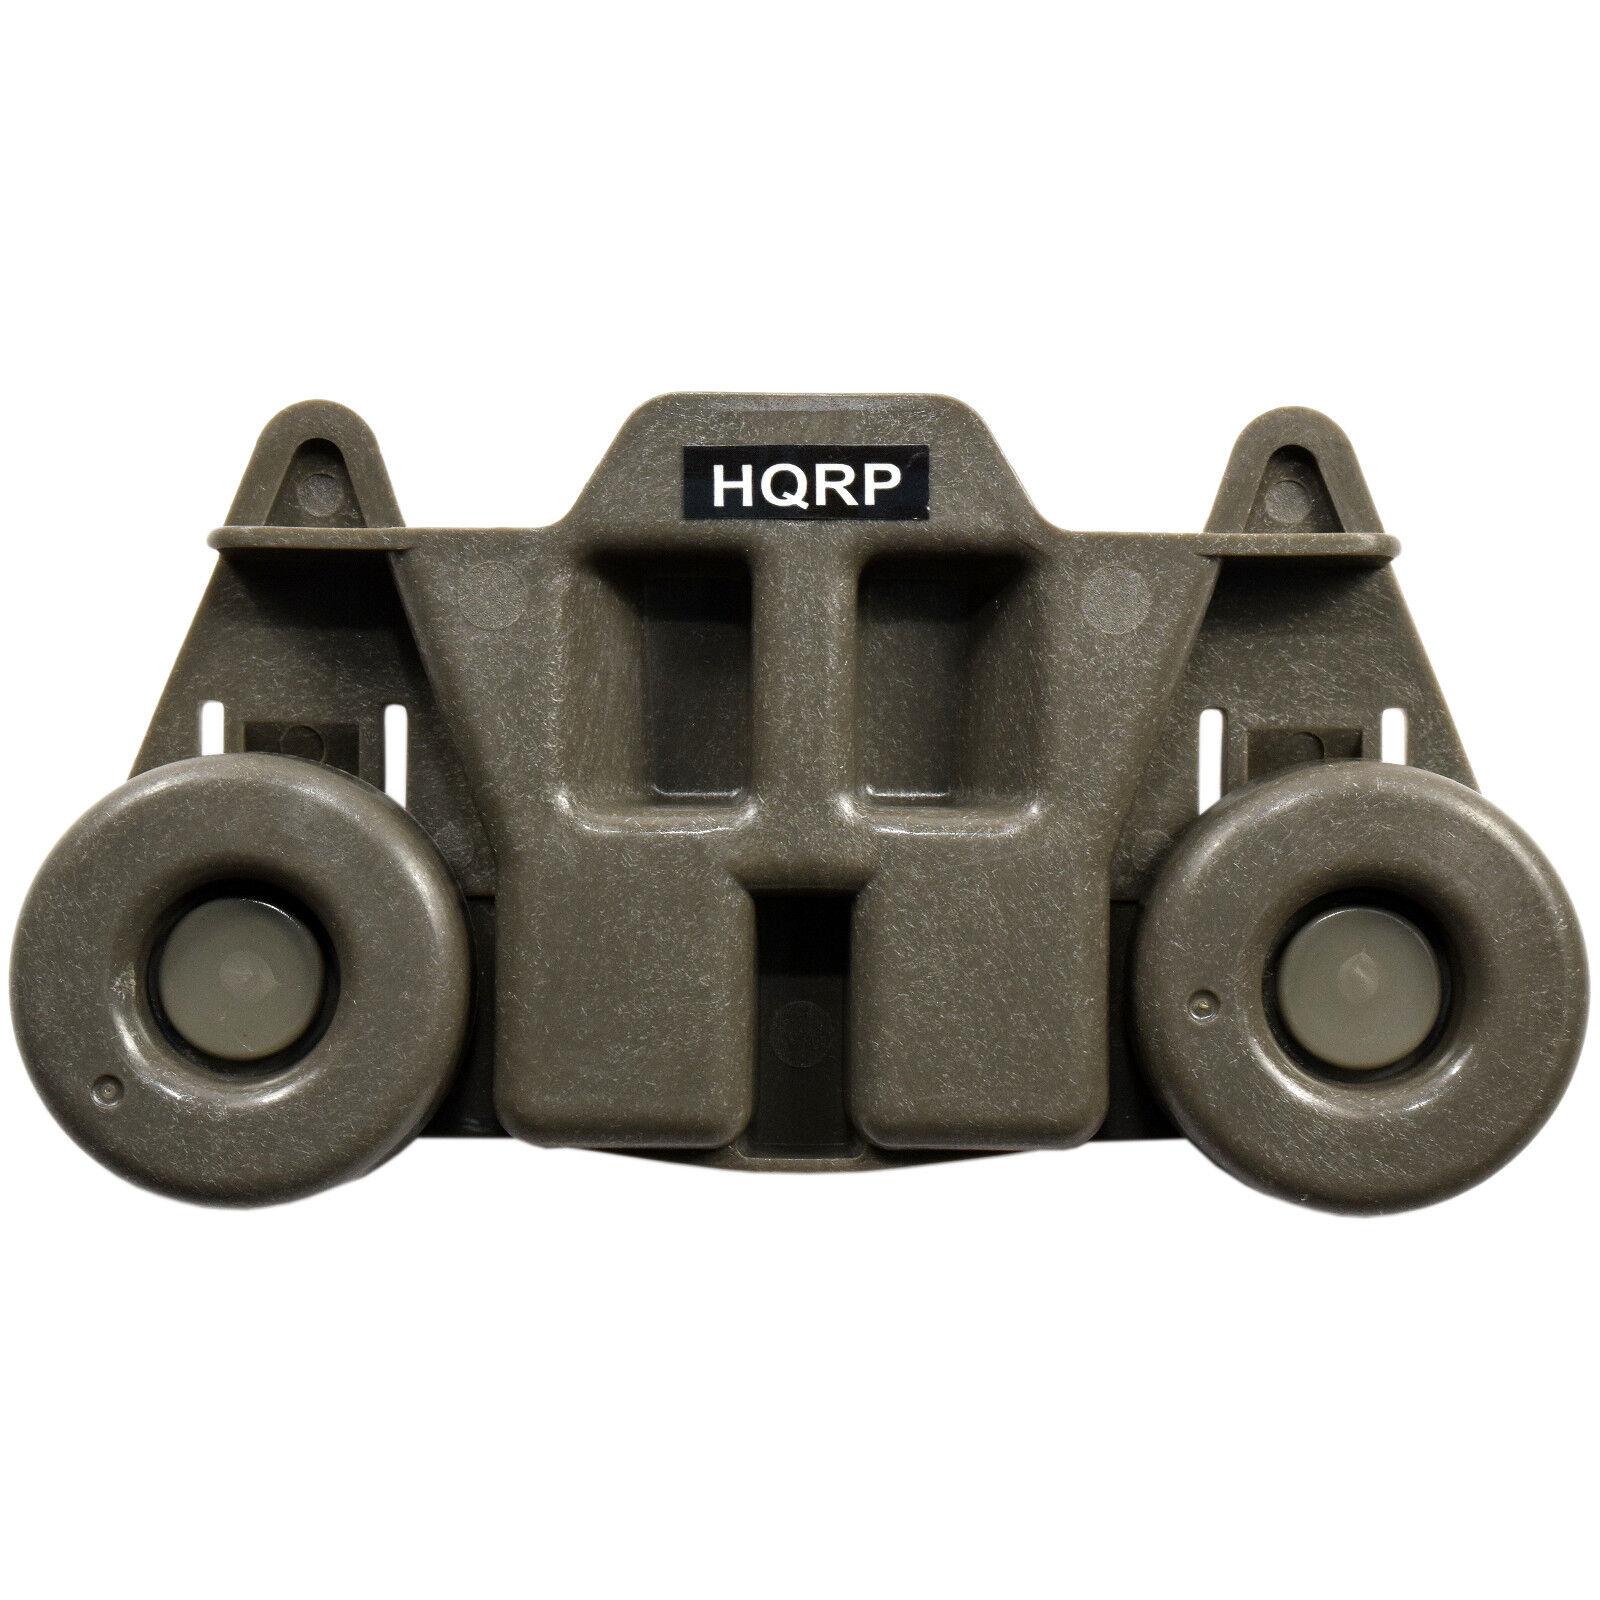 HQRP Wheel for Maytag Dishwasher Dishrack Roller Dish Rack,